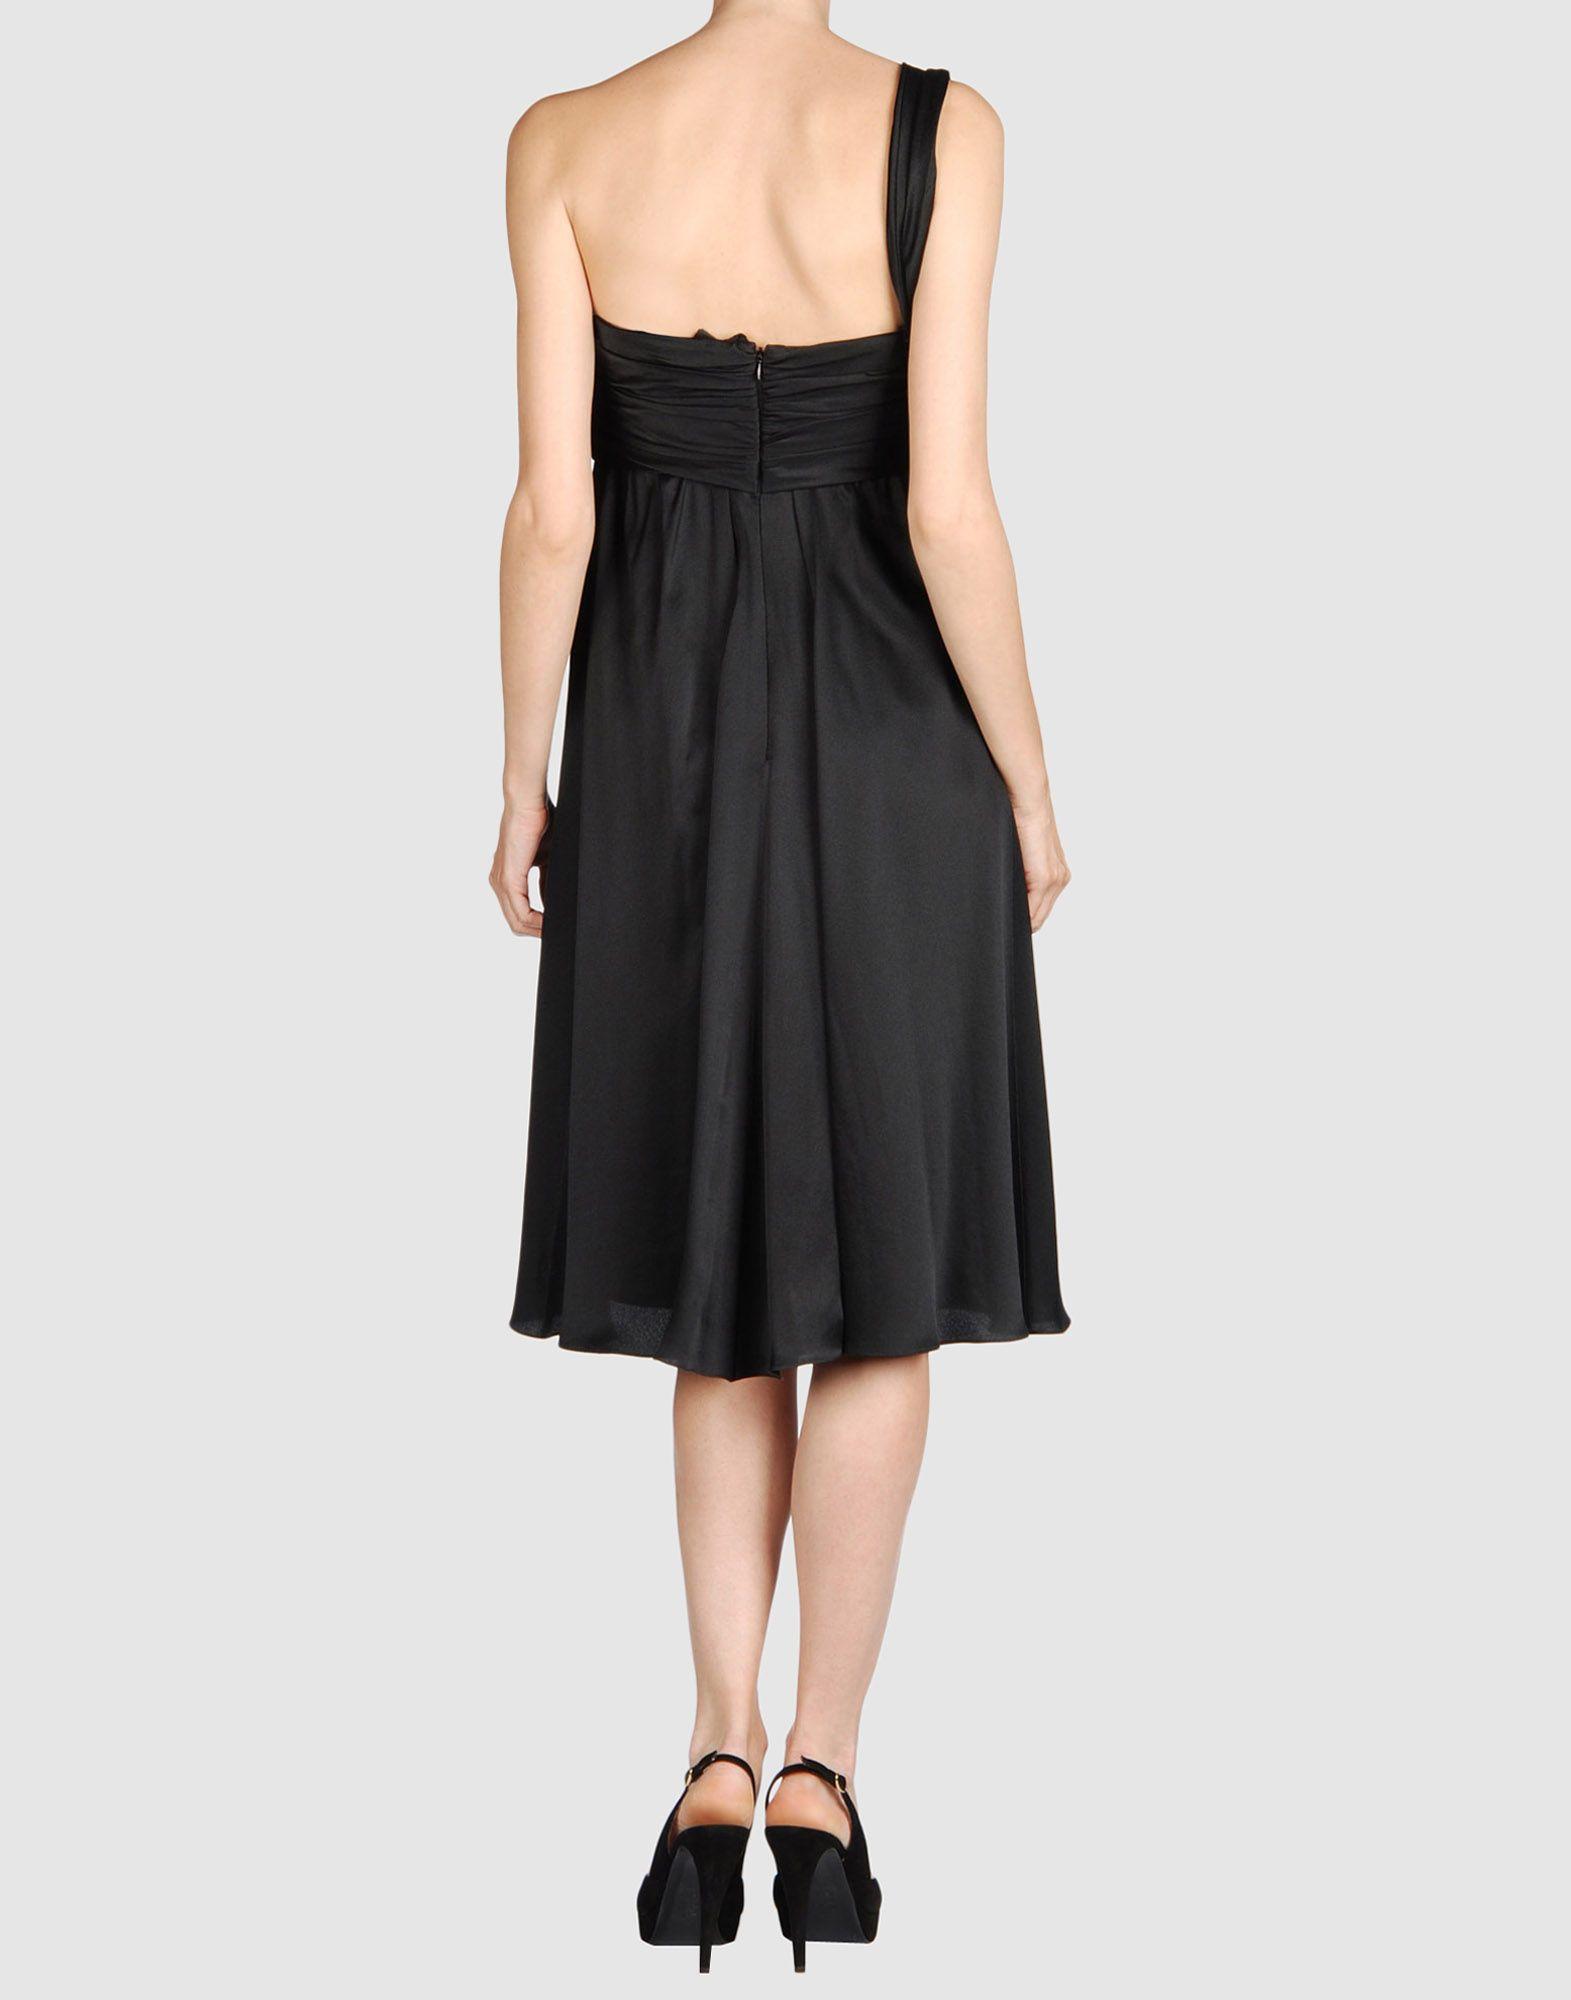 c5fd2cb327e Βραδυνα Φορεματα Max Mara 2012 Κωδ.11 | Βραδυνά φορέματα από τους ...